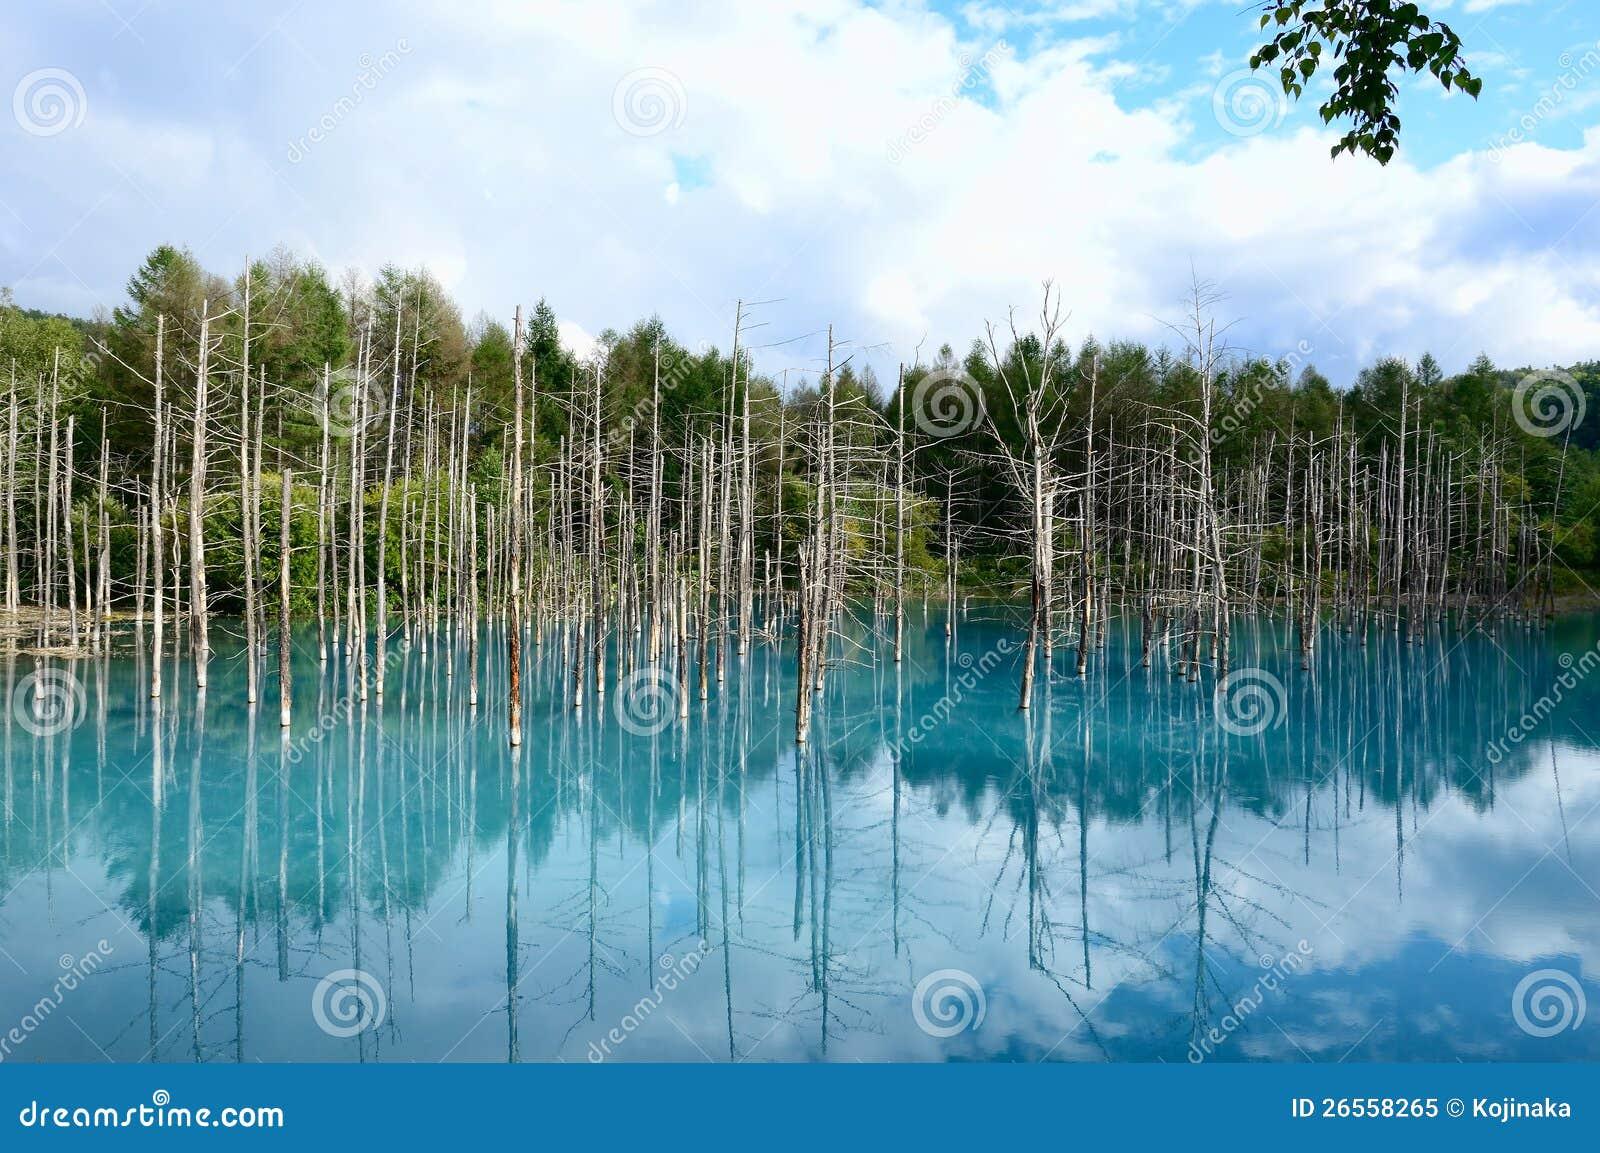 Biei blue pond stock photo 79660398 for Pond dealers